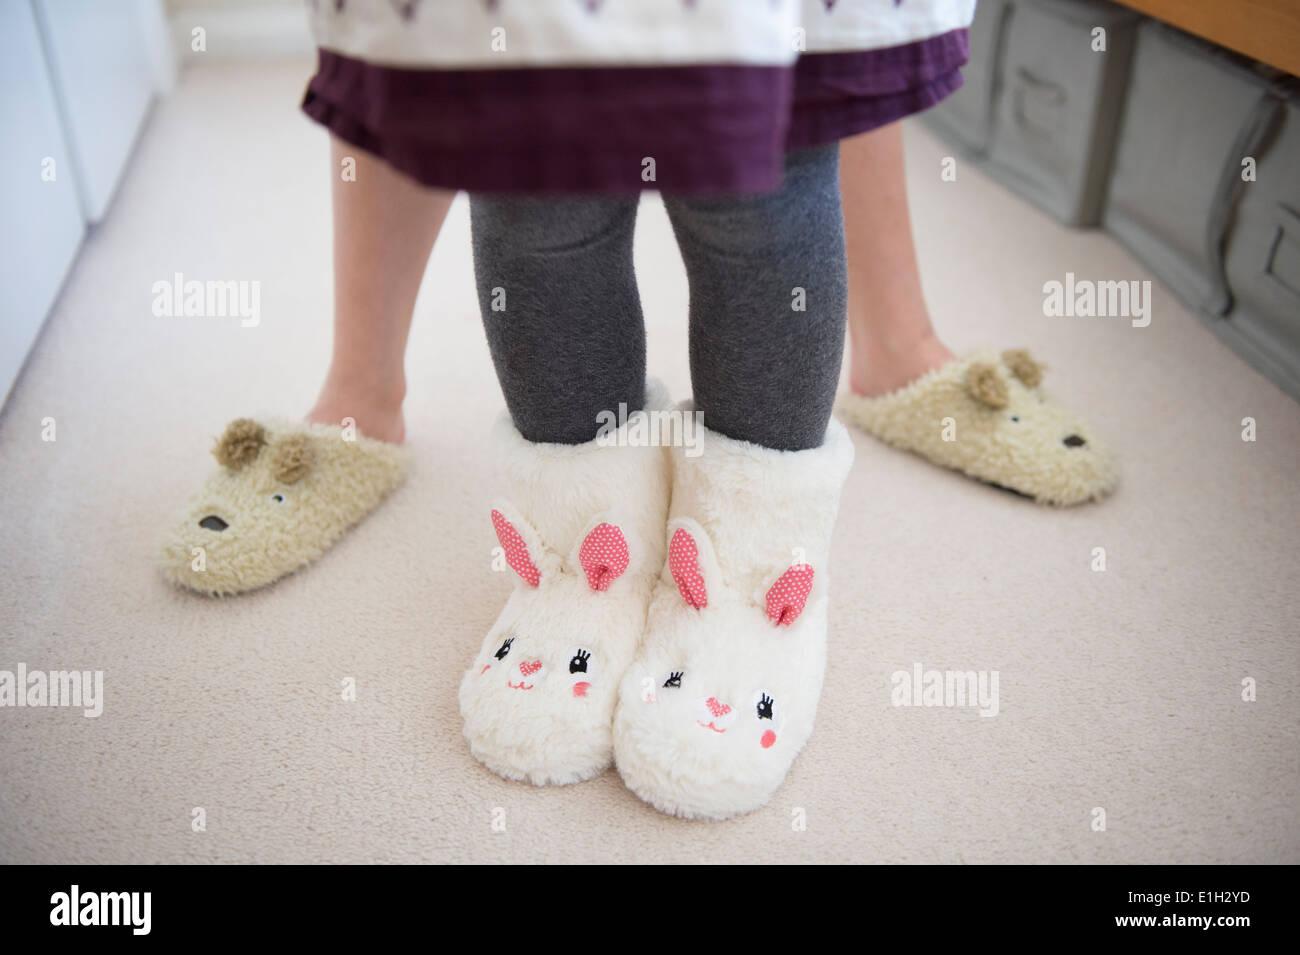 Children wearing animal slippers - Stock Image